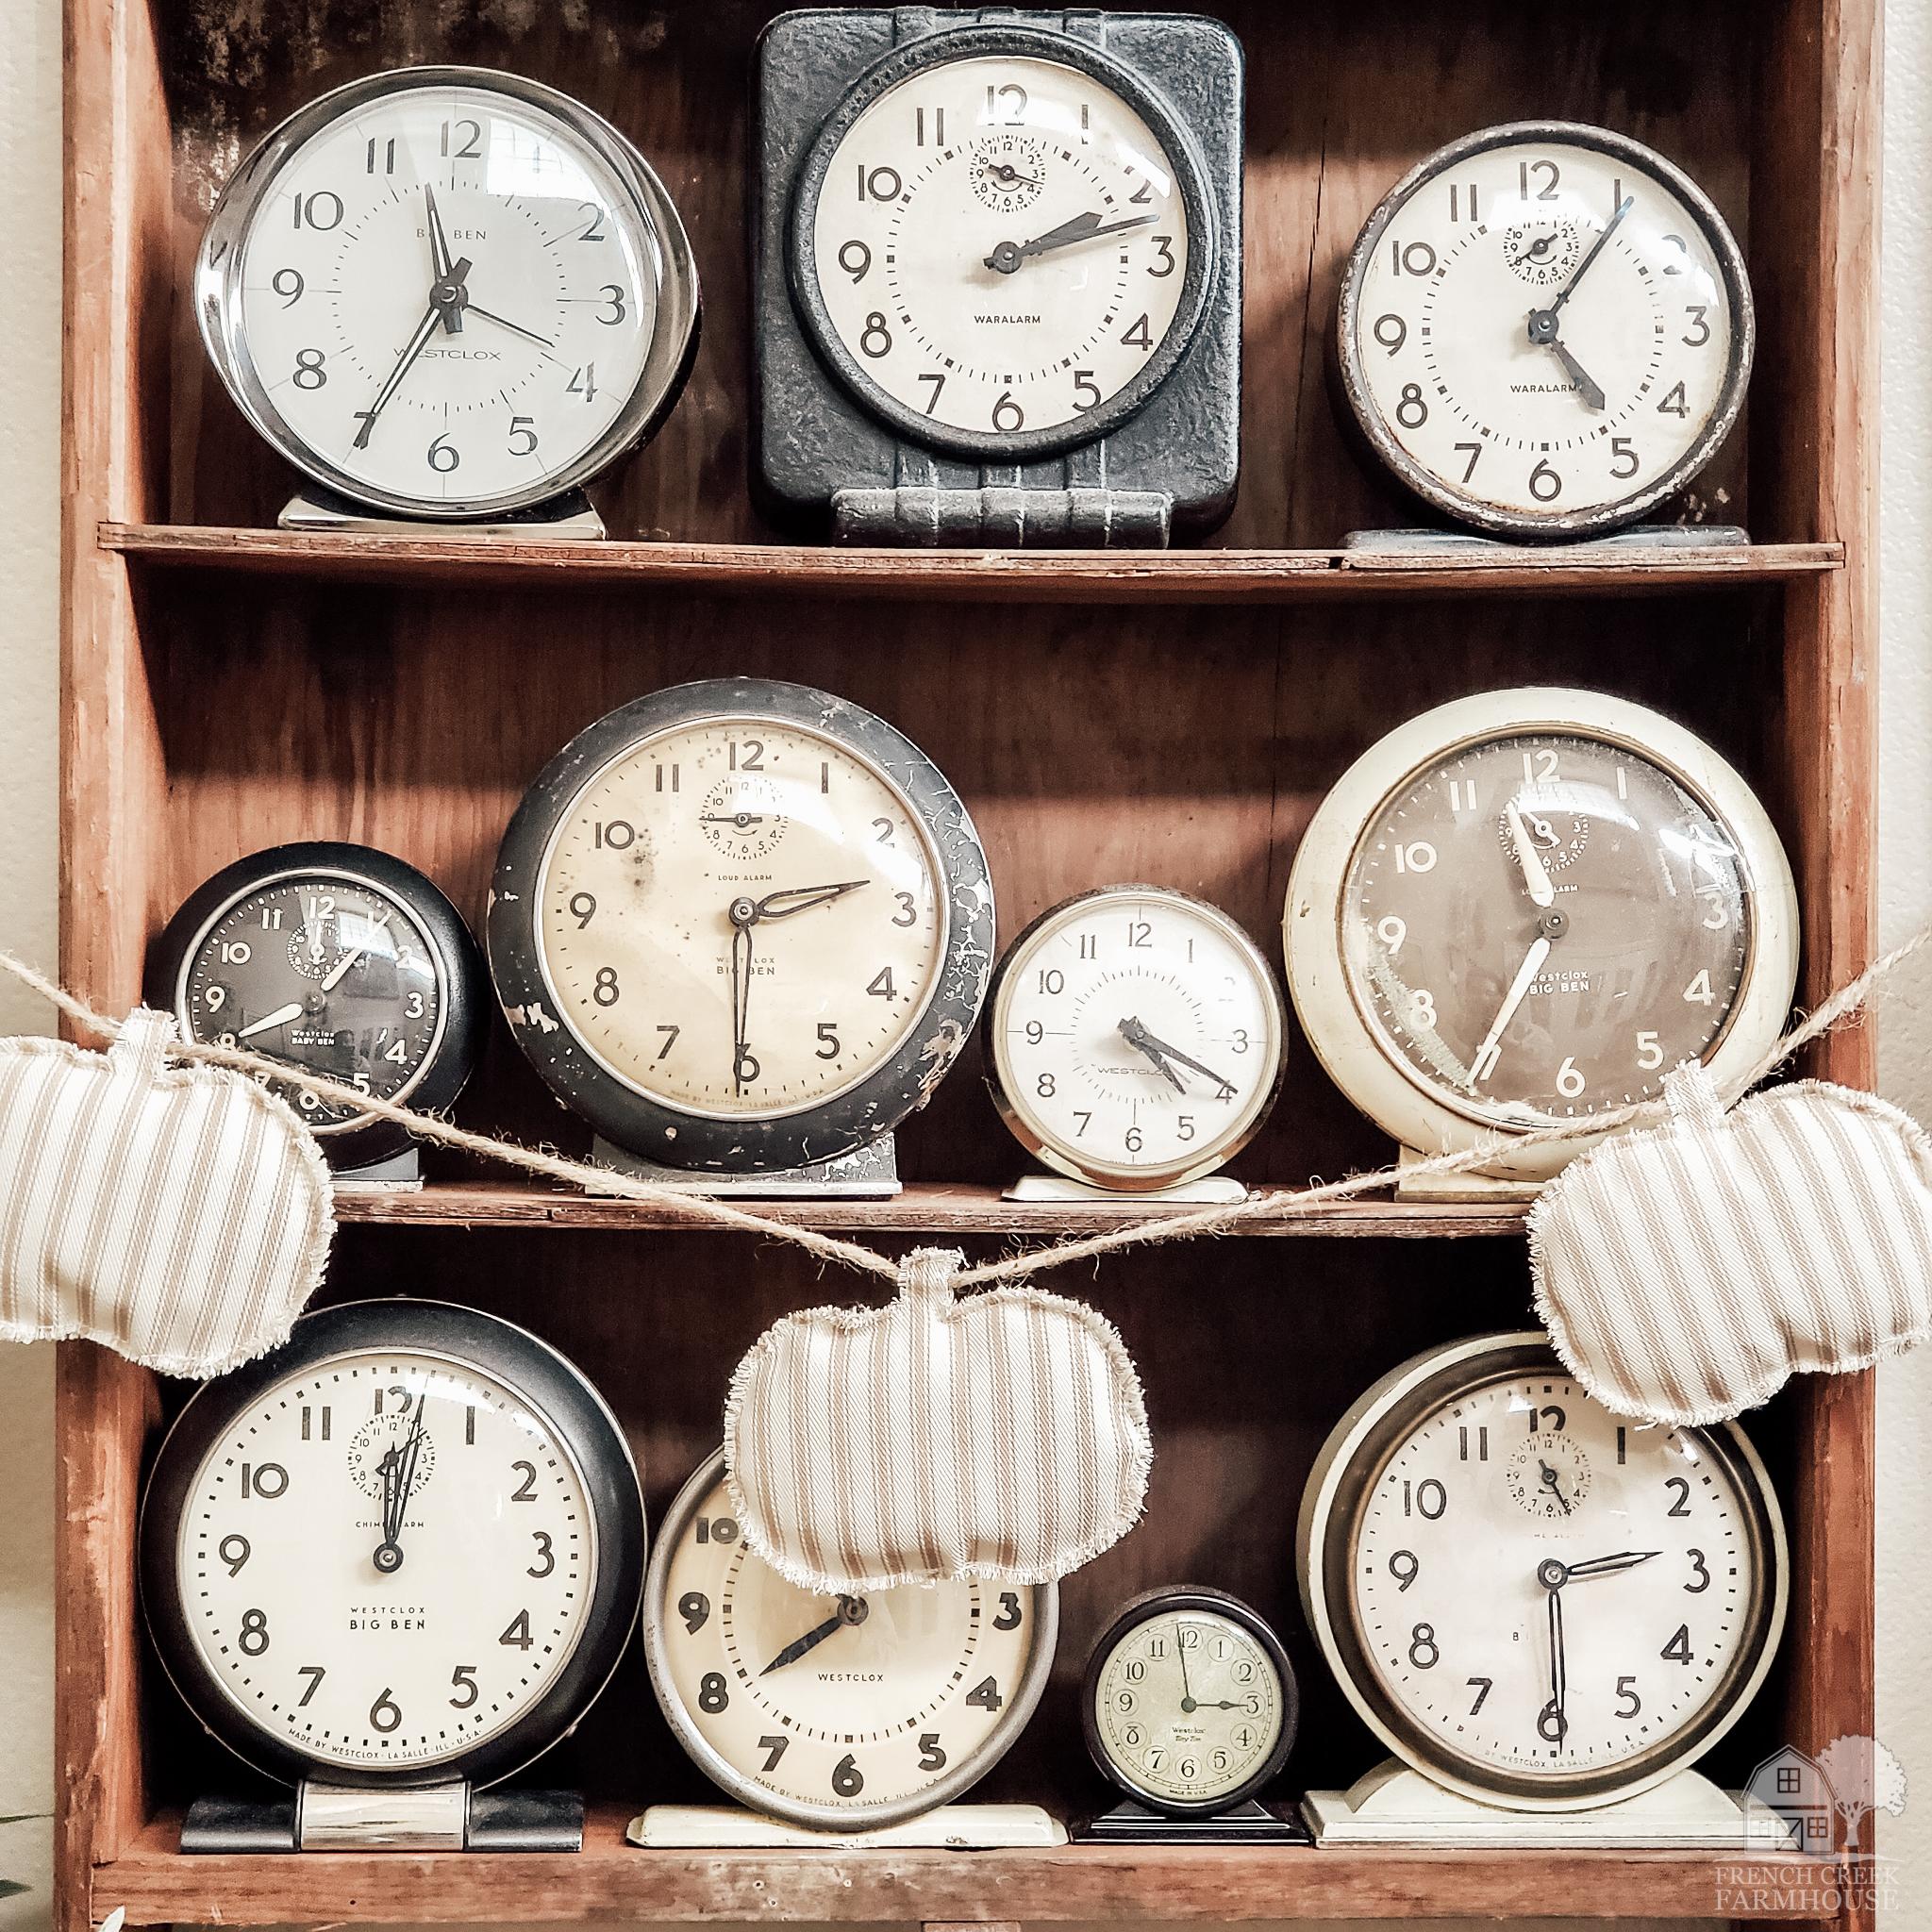 Pumpkin garland hanging in front of vintage clocks